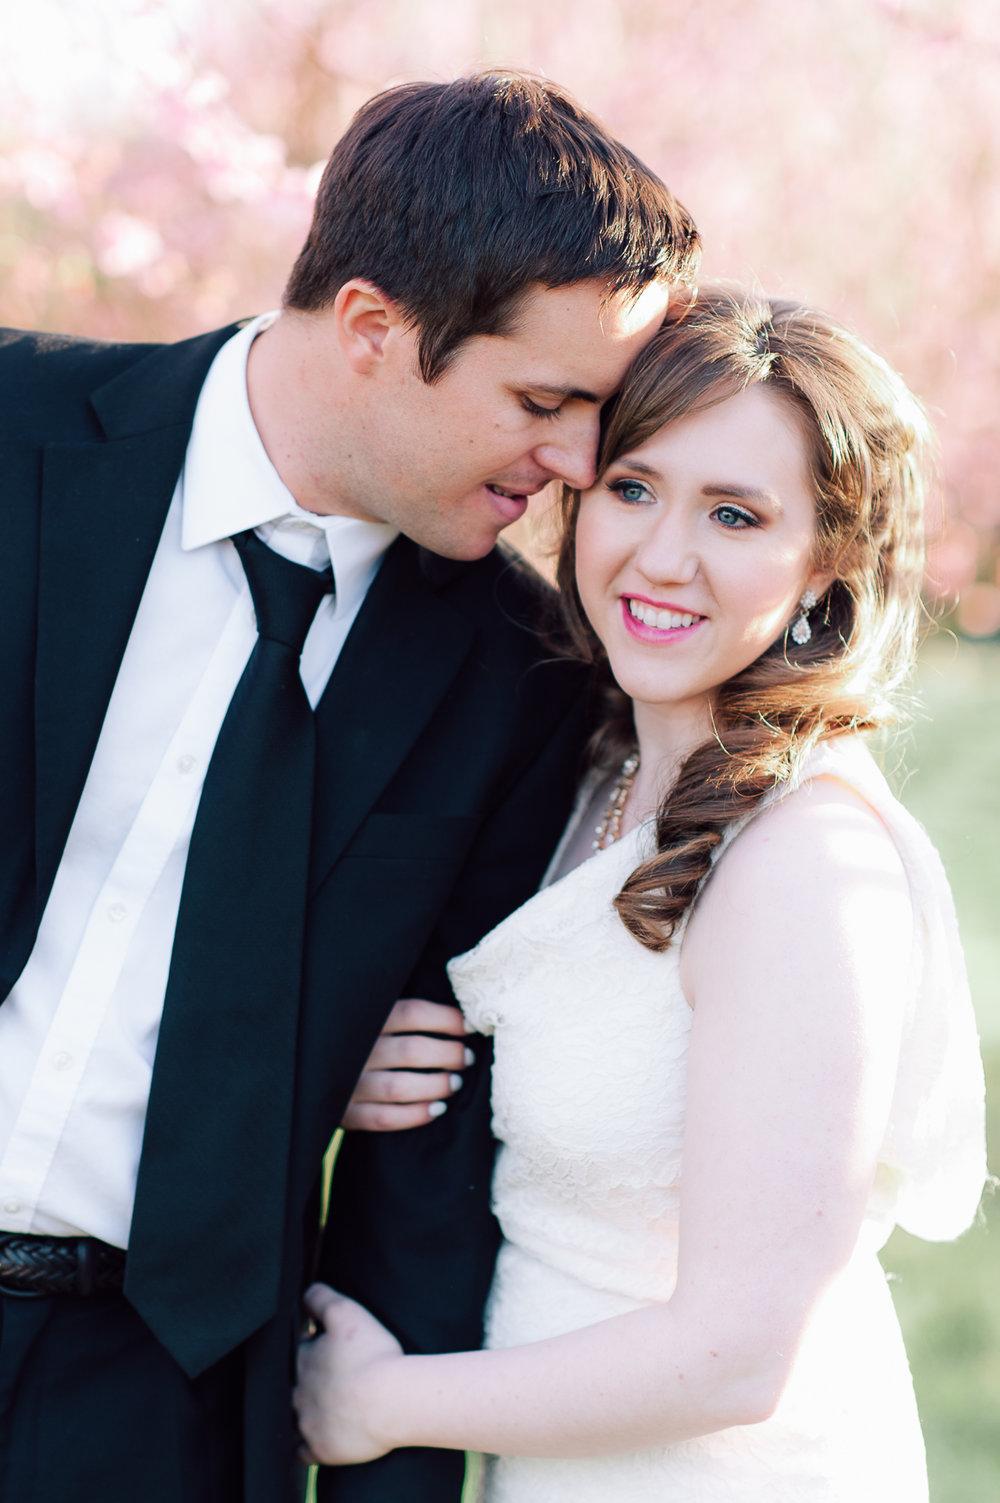 springwedding_cherryblossoms_virginiaphotographer_youseephotography_styledshoot (564).jpg